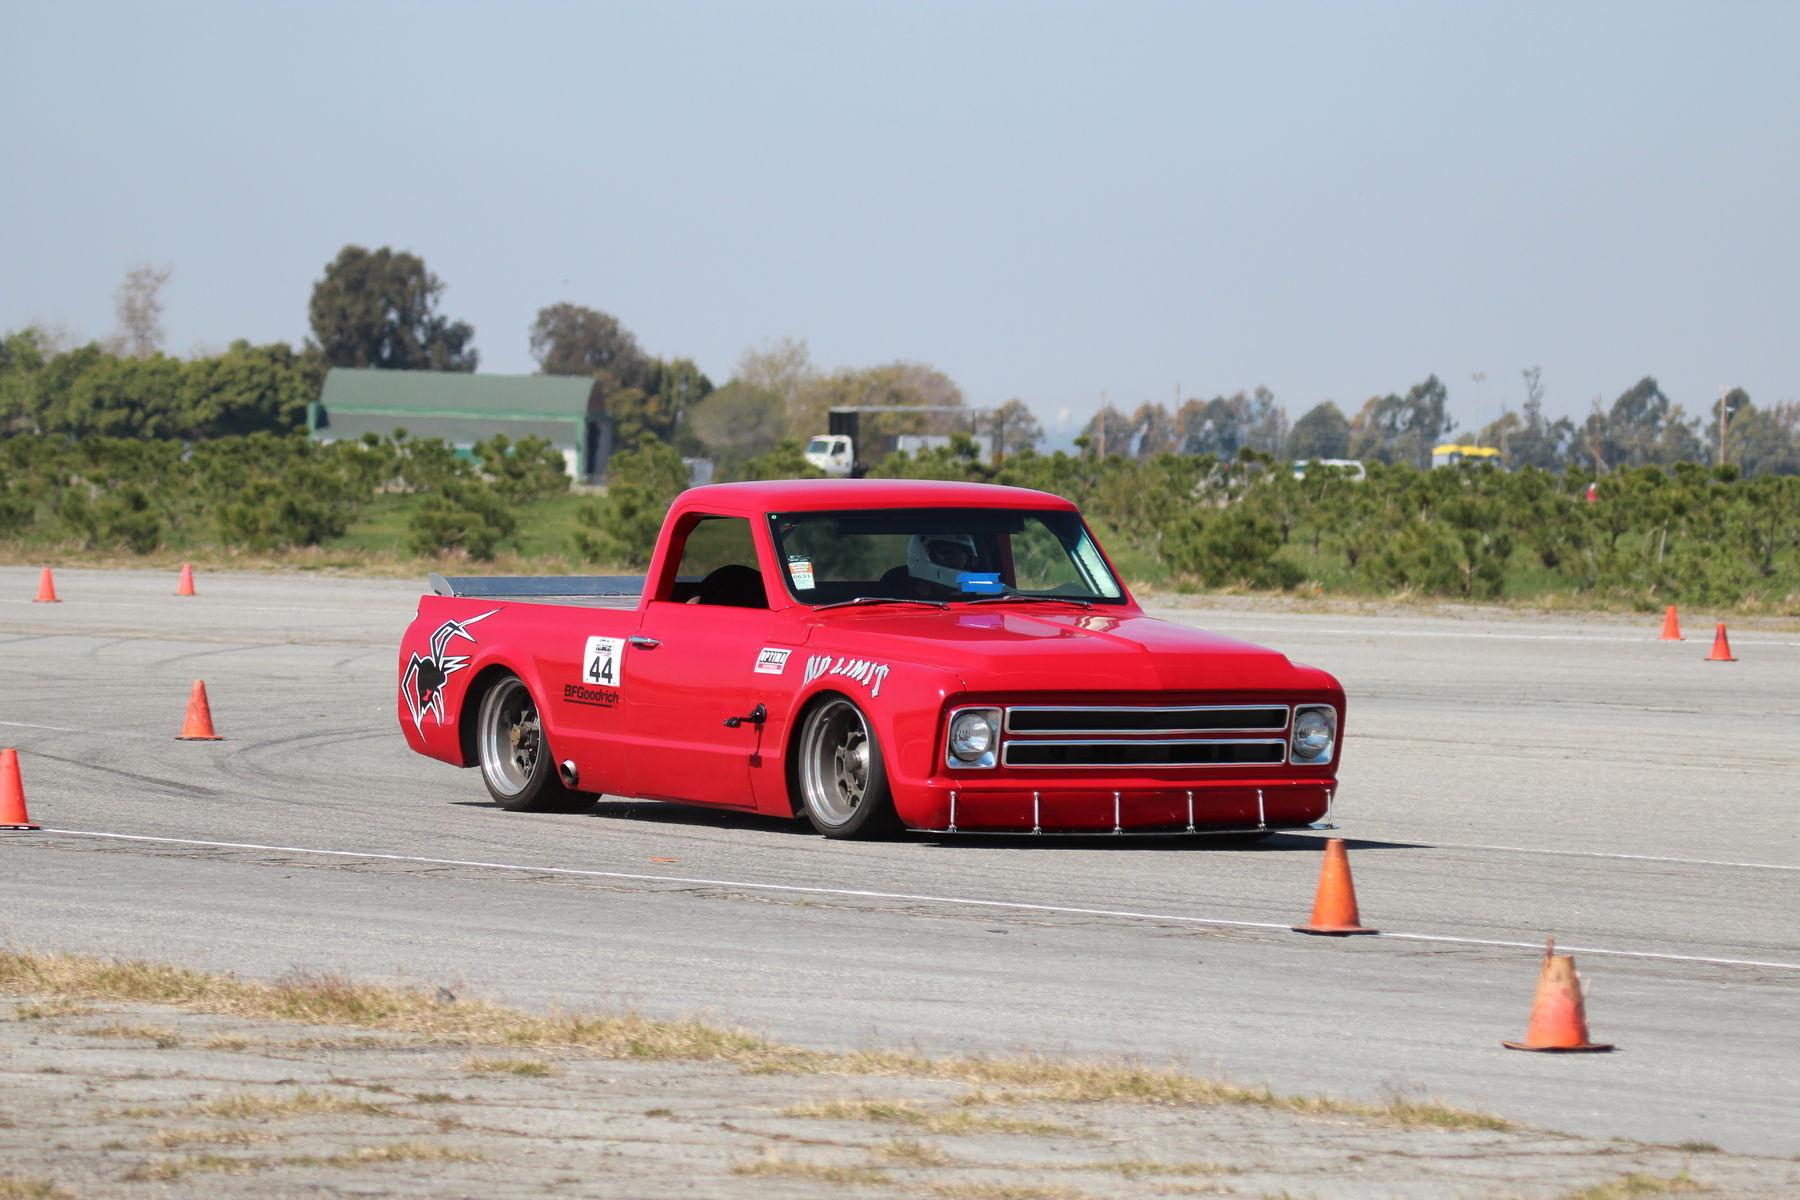 1970 Chevrolet C-10 | No Limits Engineering Chevy C10 'Hellboy'